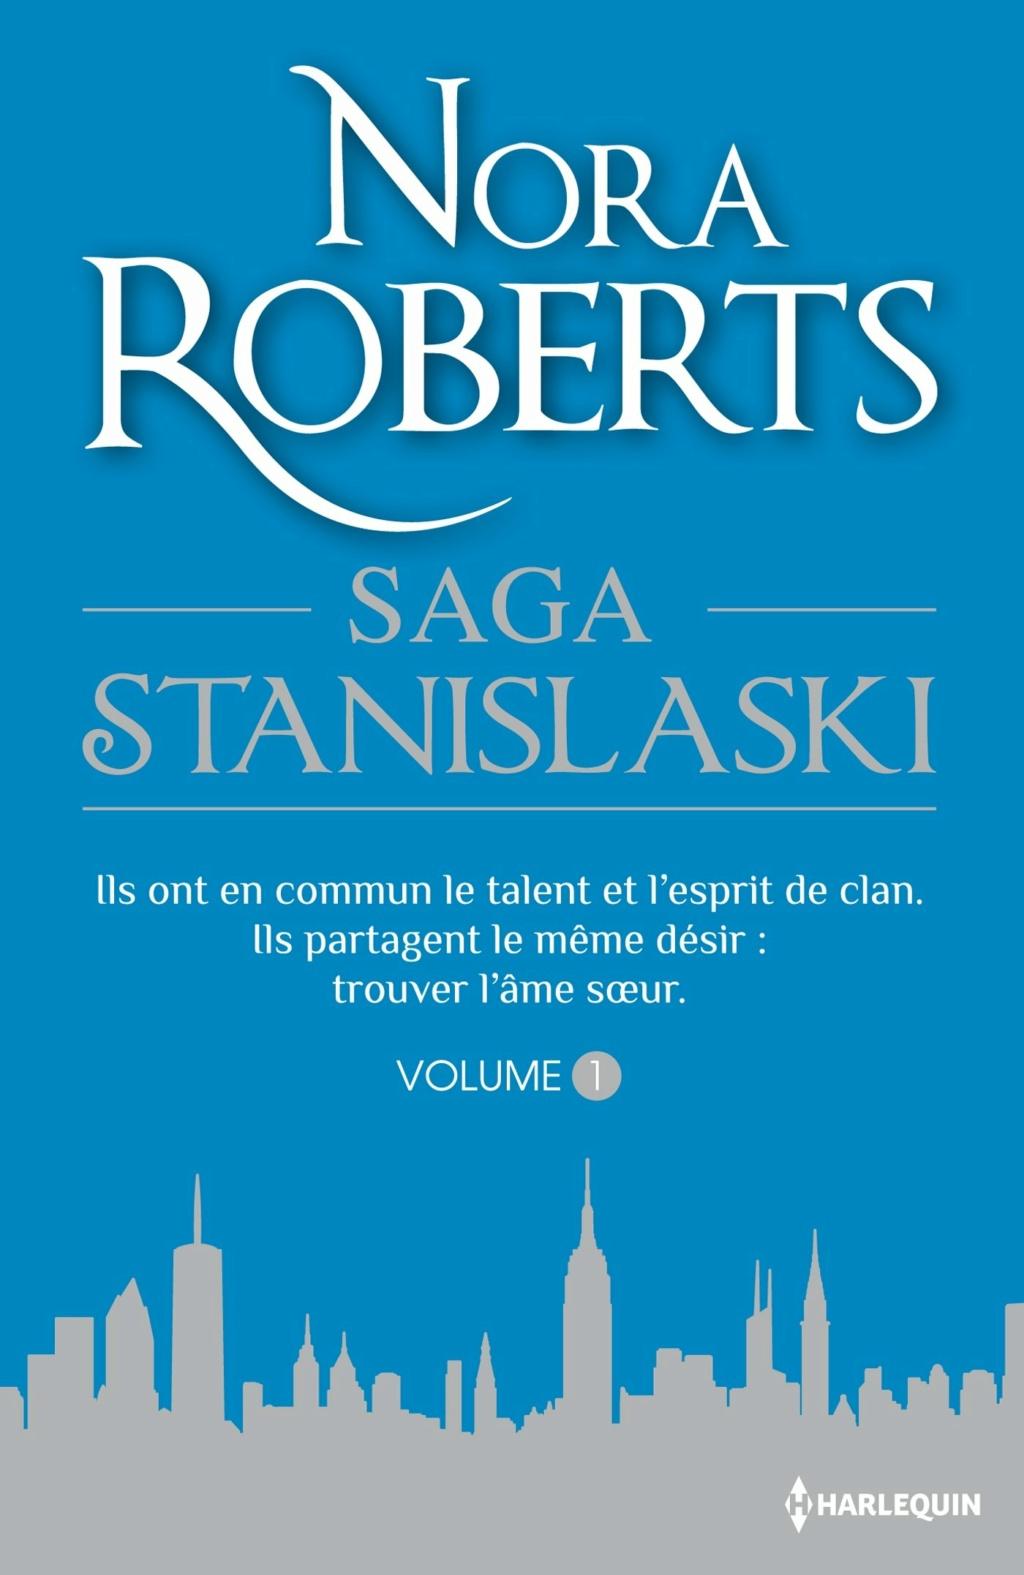 [Roberts, Nora] Saga Stanislaski - Tome 1: Secrets de famille - Un bonheur à bâtir 71-6li10